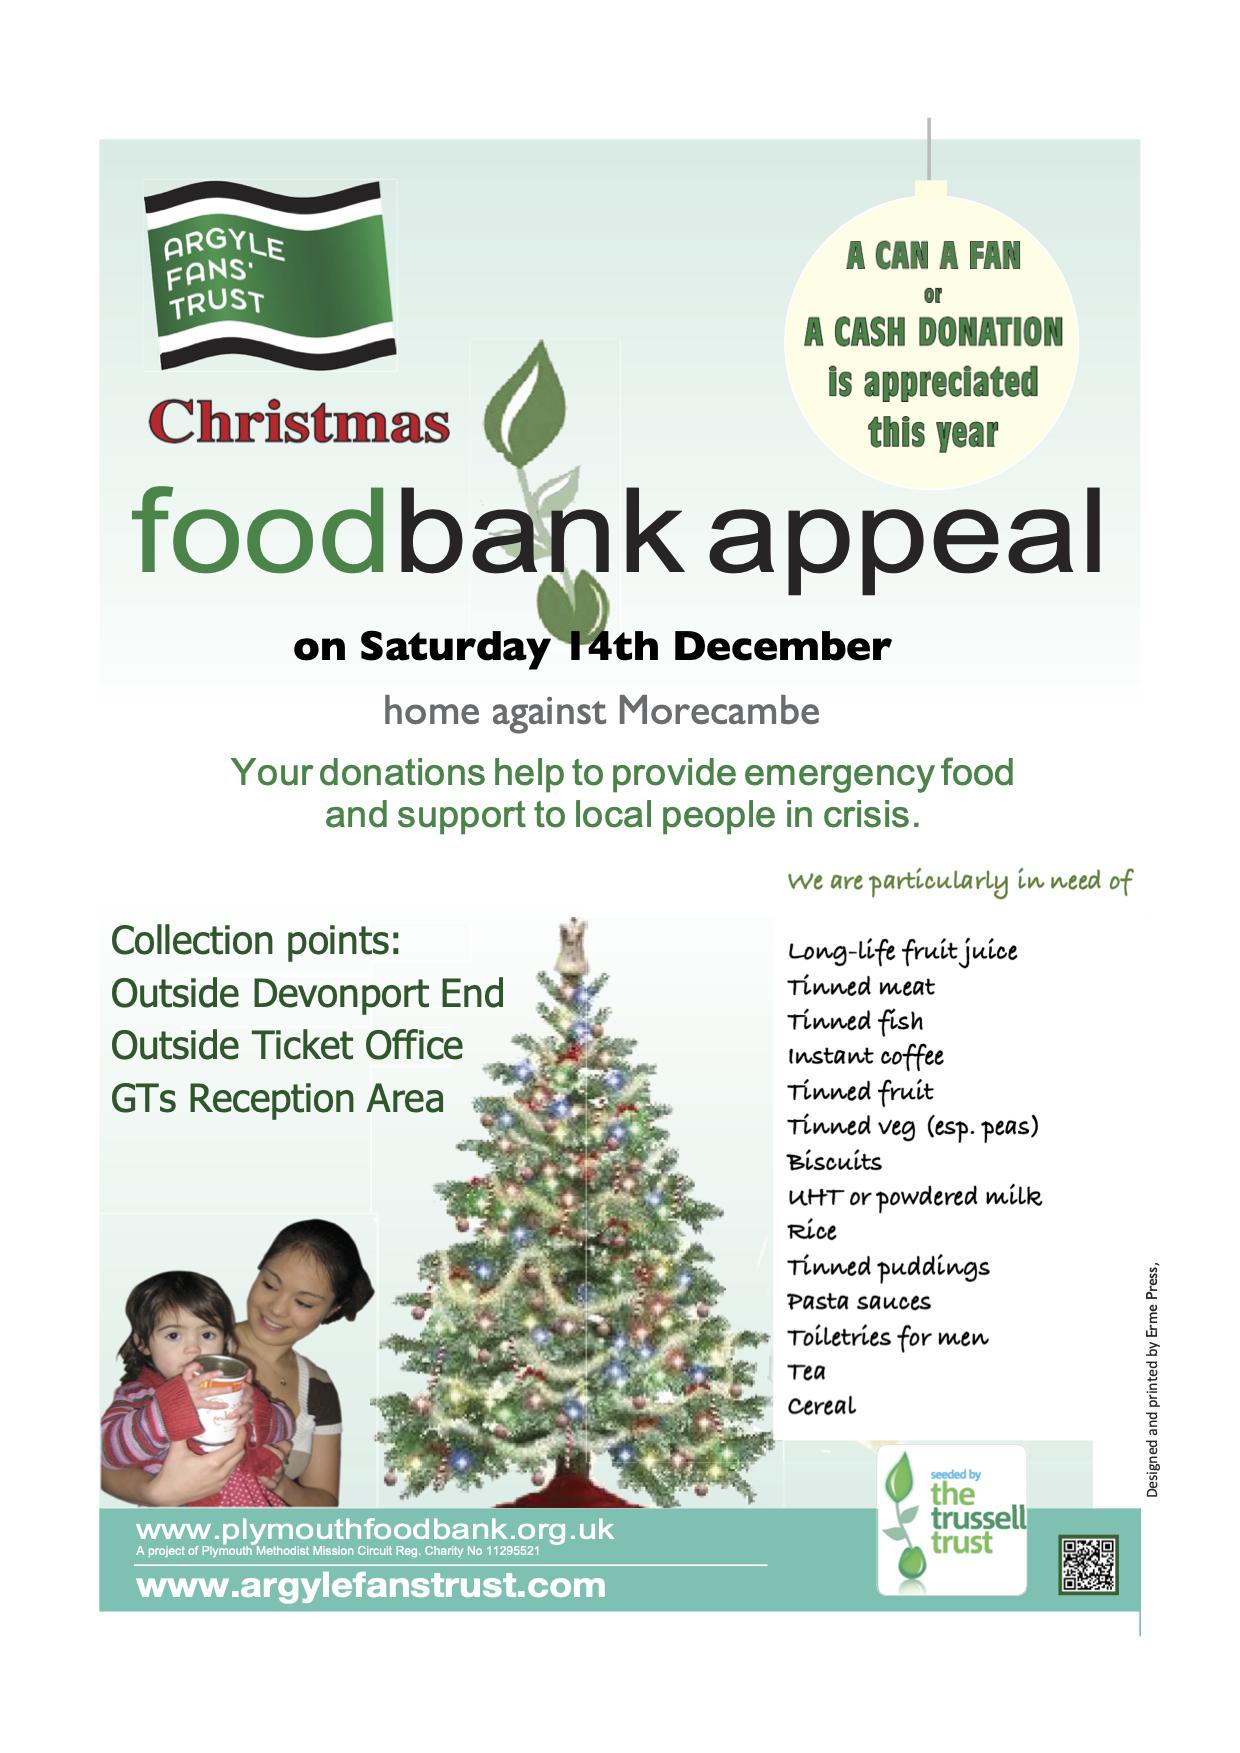 Christmas Foodbank Appeal Argyle Fans Trust